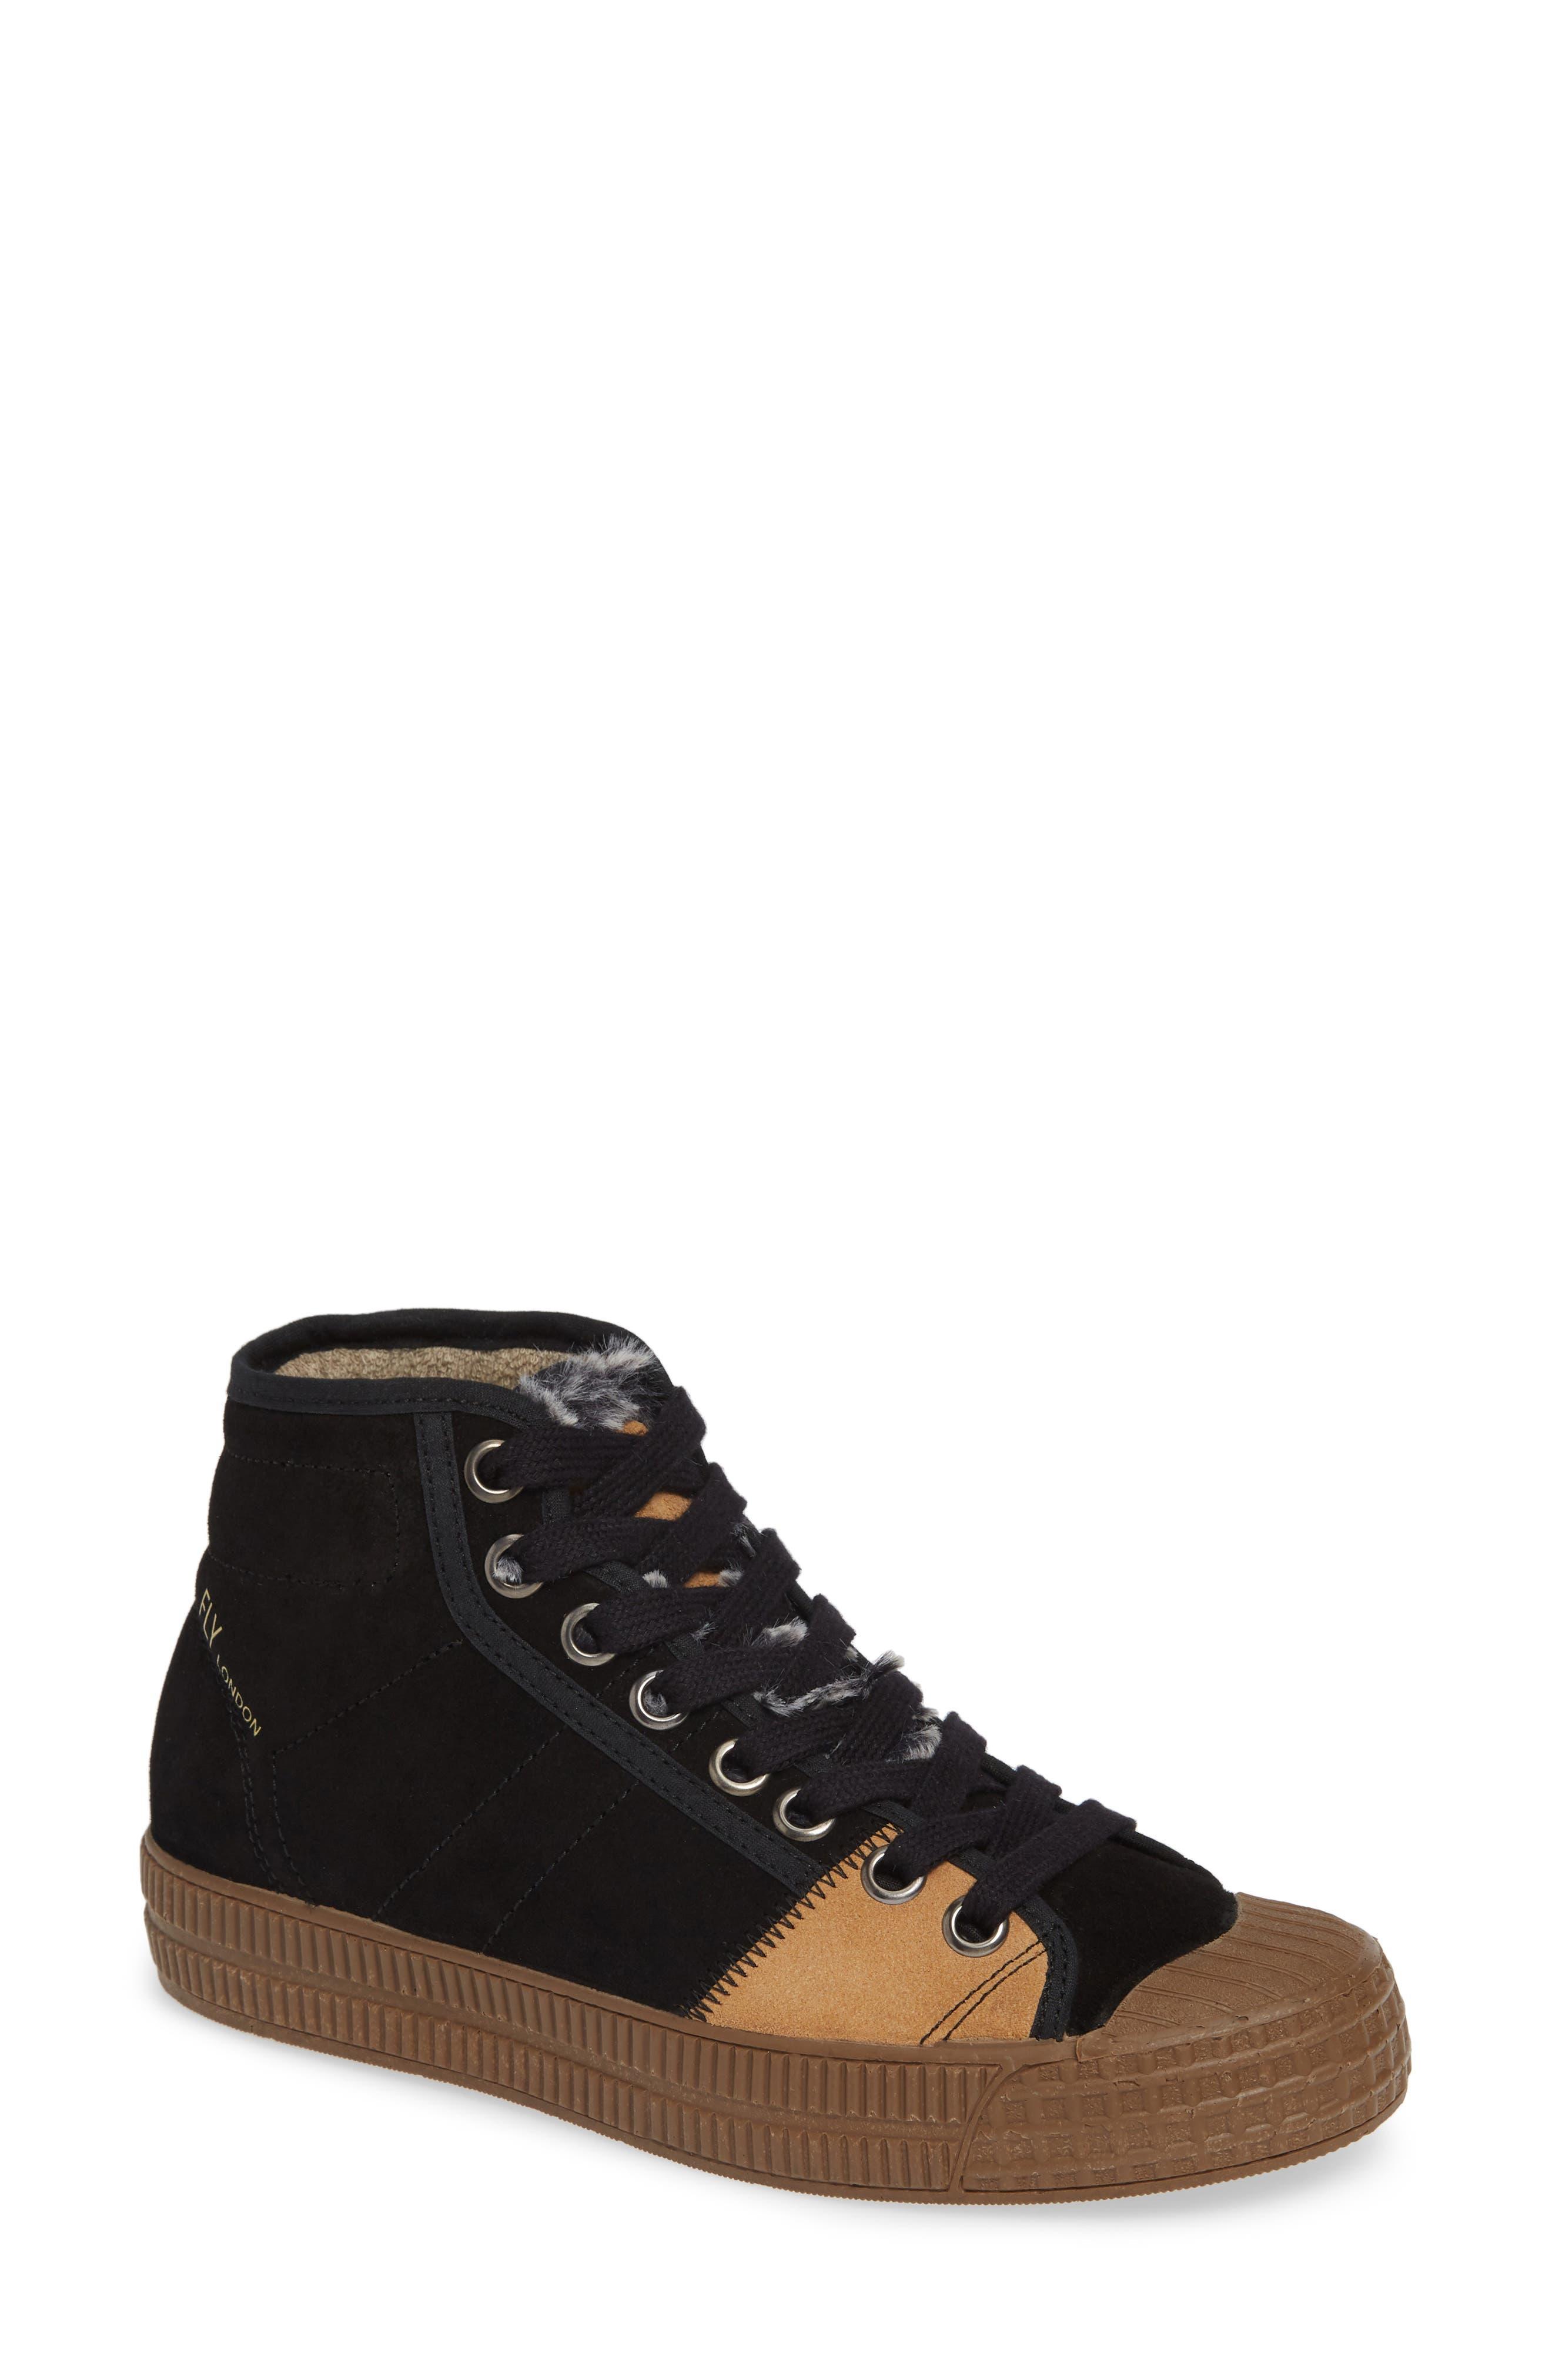 Femp High Top Sneaker,                             Main thumbnail 1, color,                             BLACK/ CAMEL SUEDE